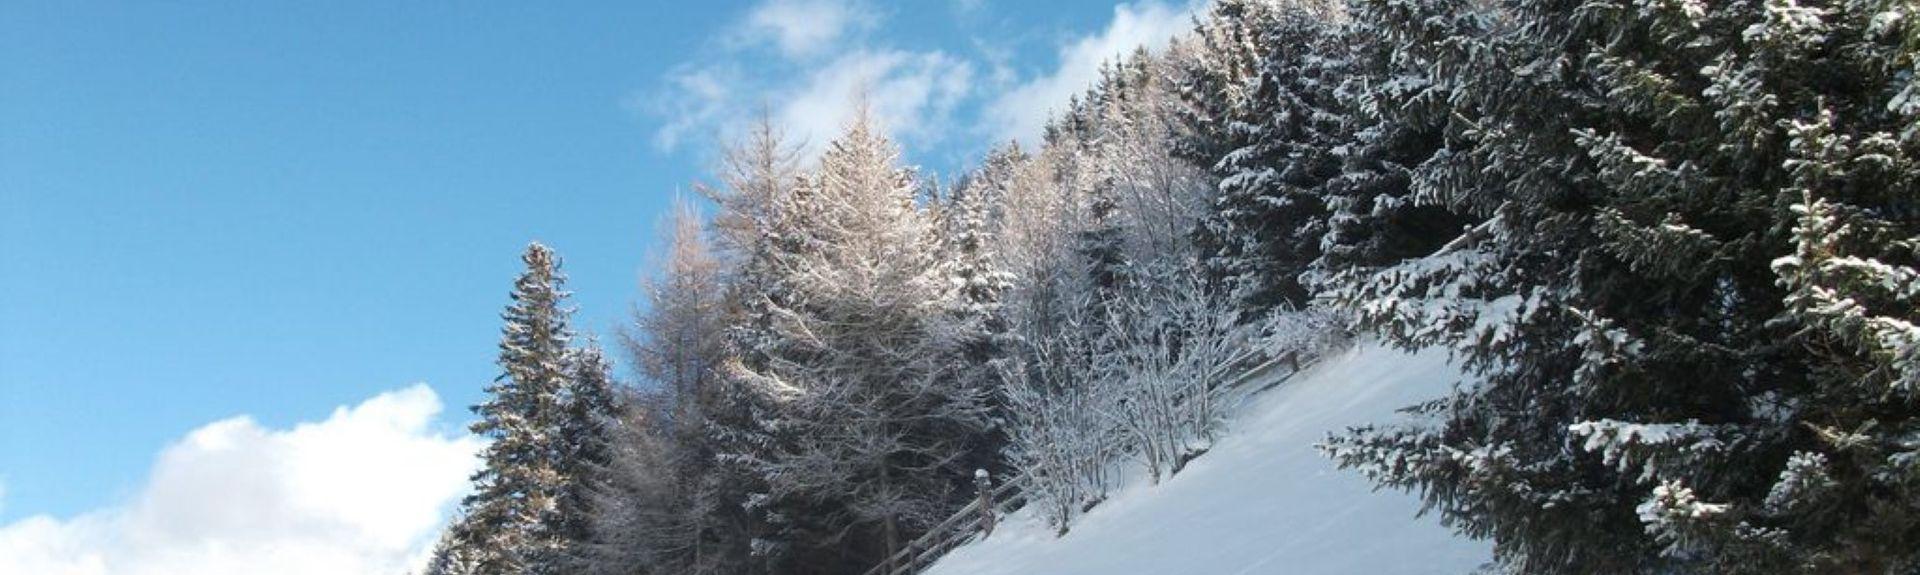 Lans, Tyrol, Austria